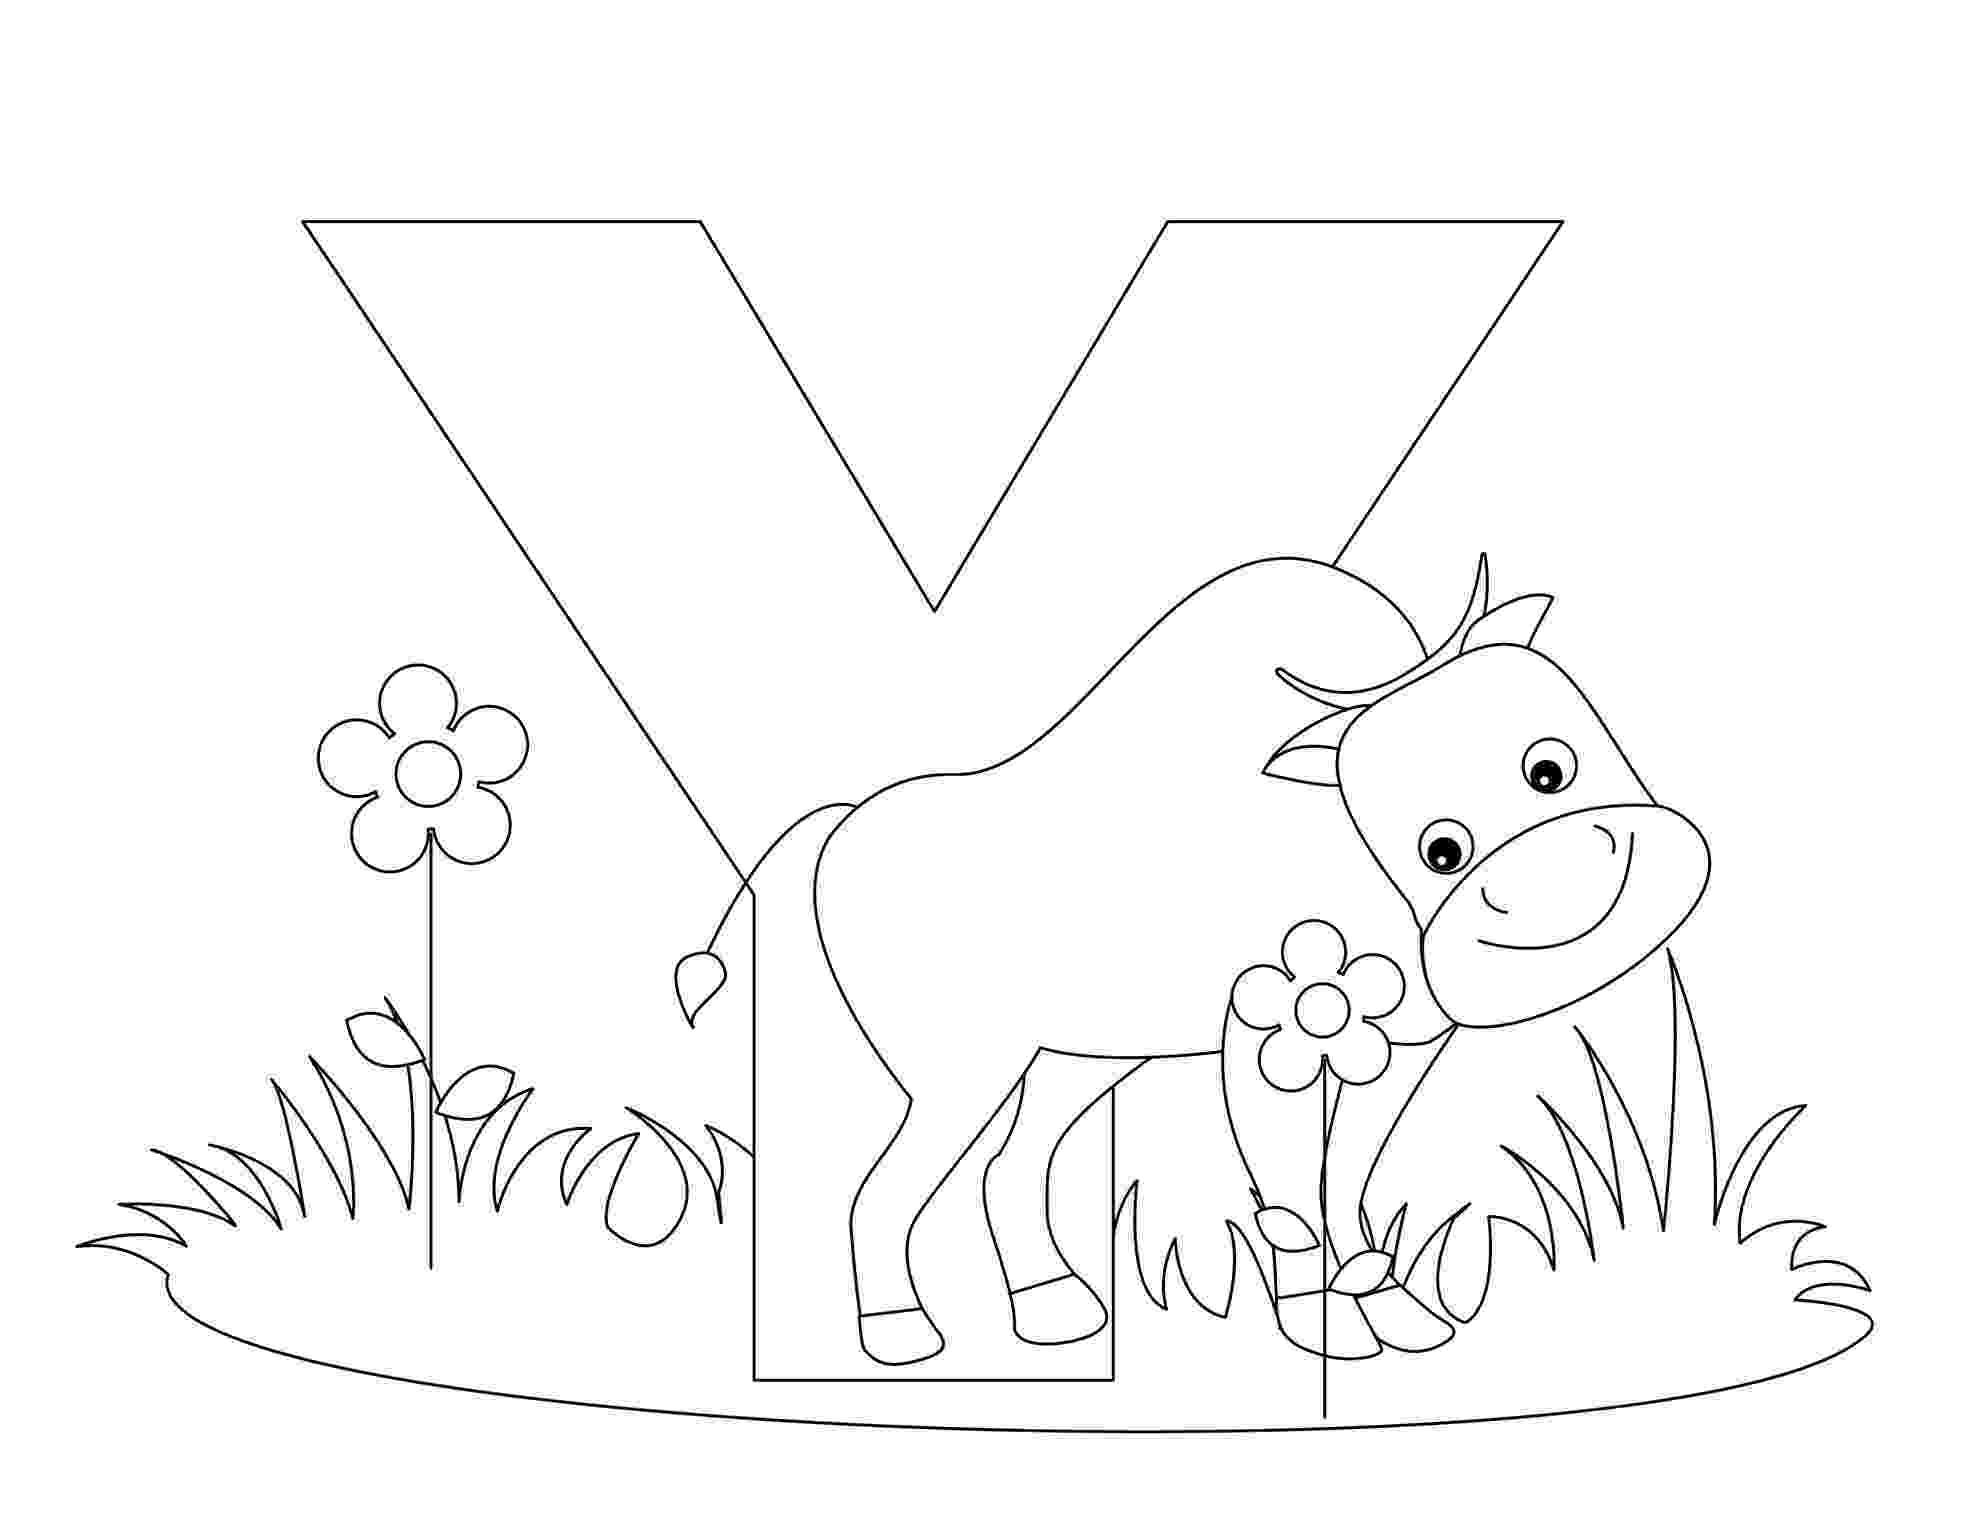 alphabet coloring worksheets free printable alphabet coloring pages for kids best coloring alphabet worksheets 1 2